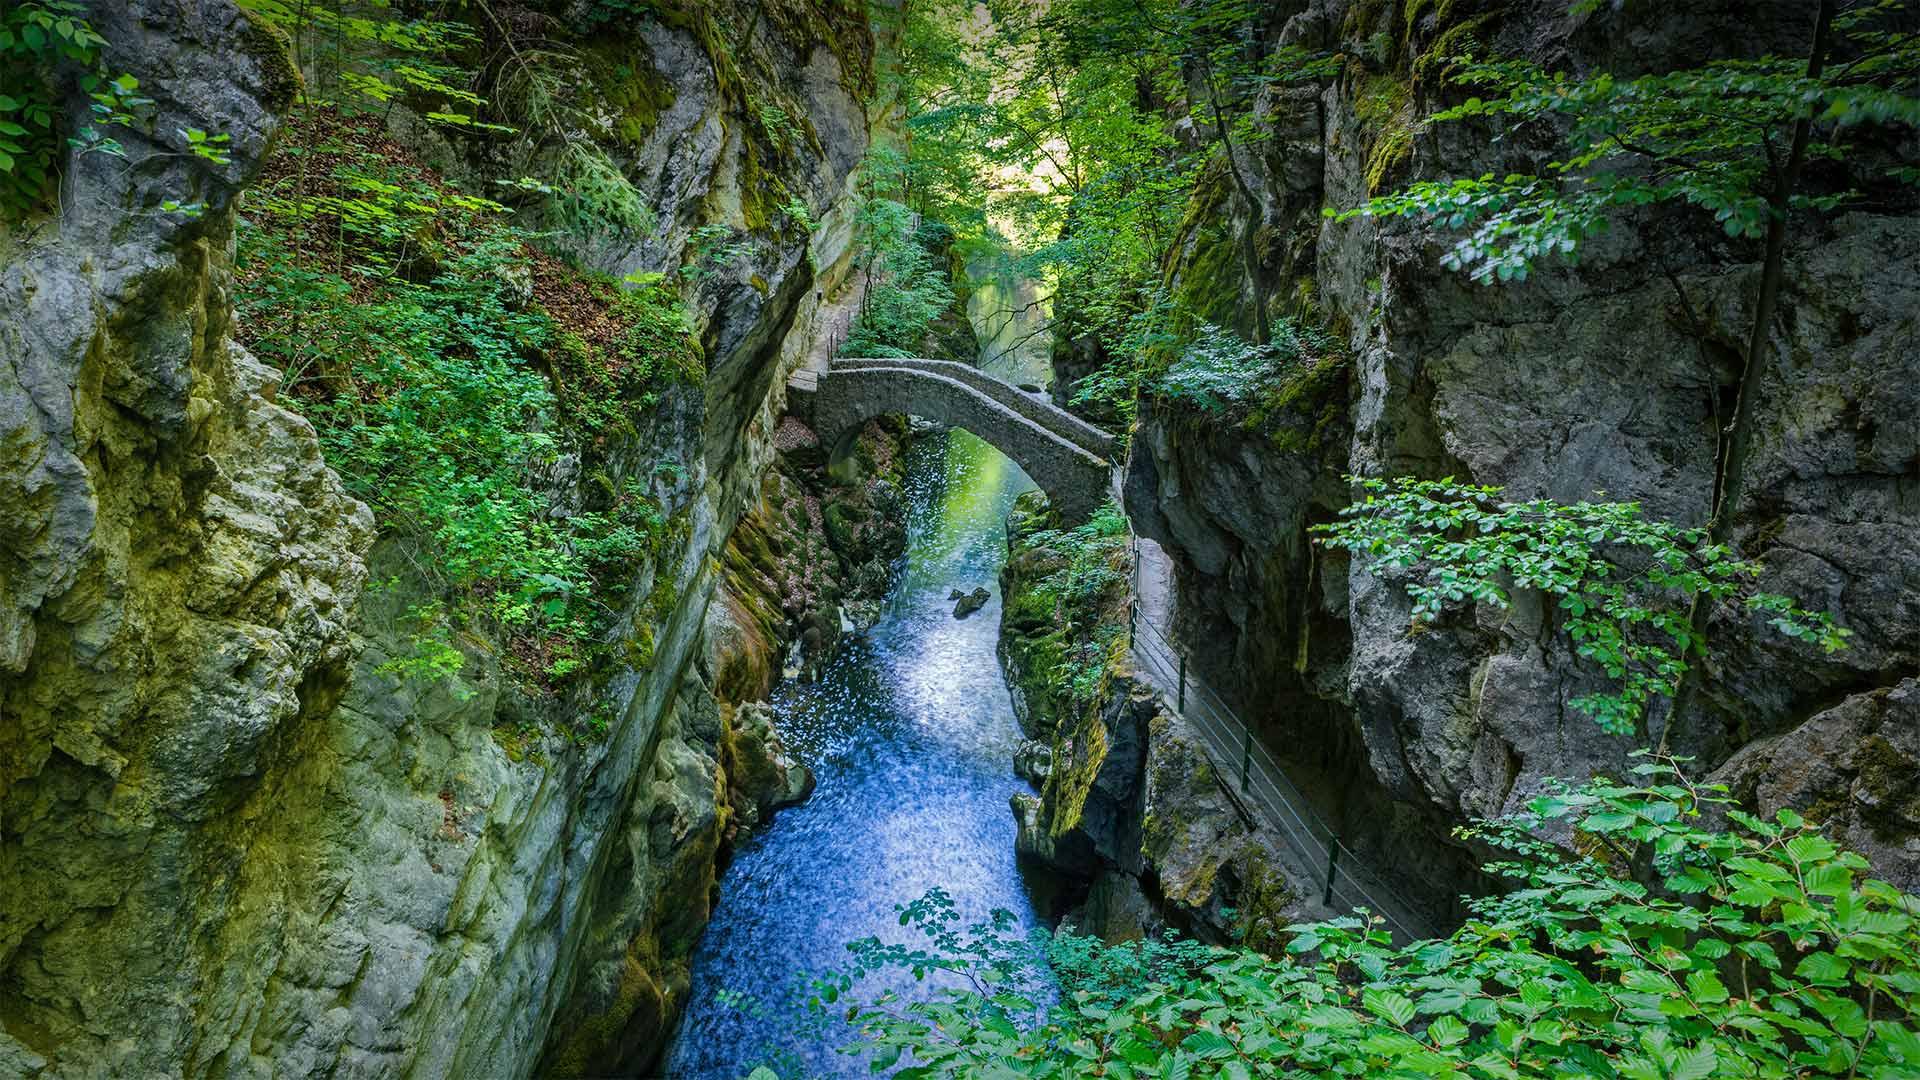 Areuse峡谷的Saut du Brot石桥,瑞士纳沙泰尔 (© Andreas Gerth/eStock Photo)